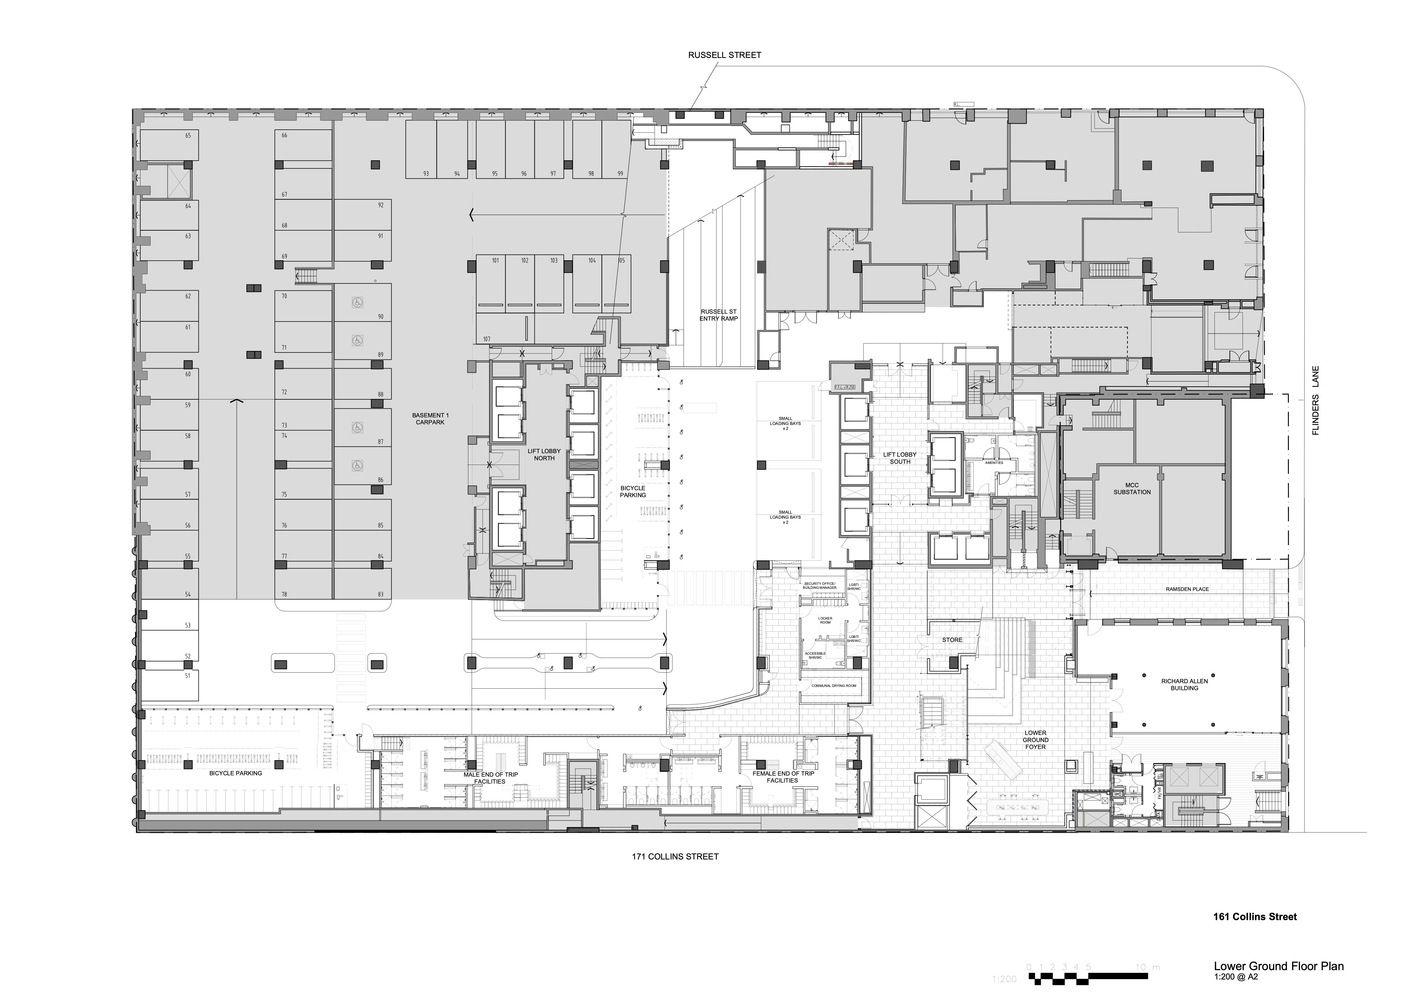 Gallery of 161 Collins Street Refurbishment / Bates Smart - 13